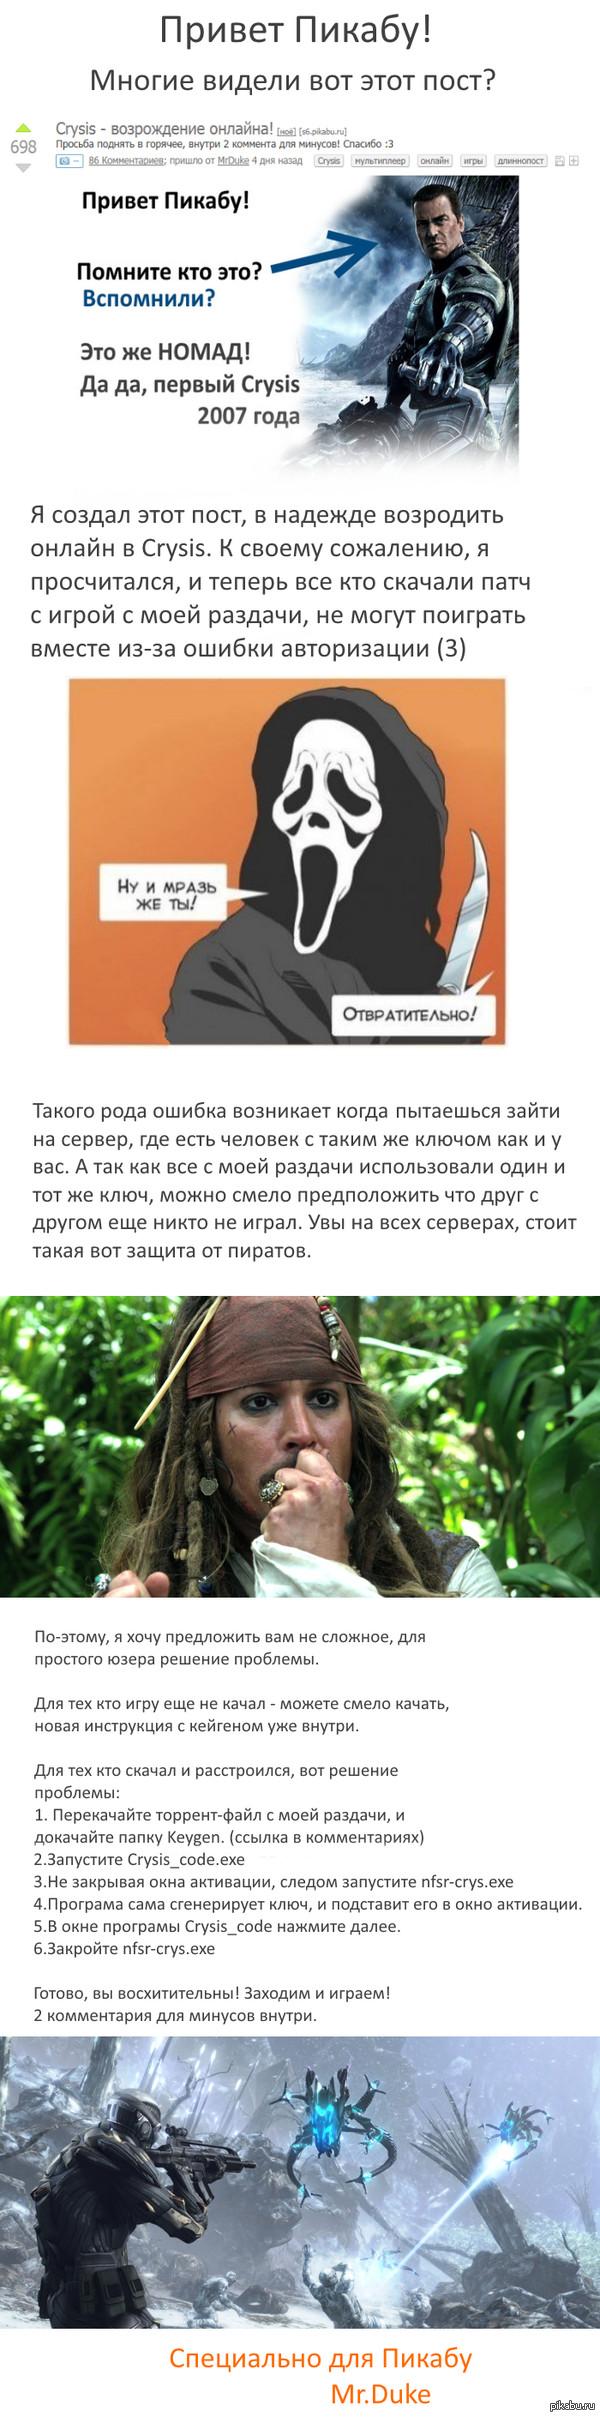 "Сrysis - исправление ошибок или как я облажался. Не топите пост, внутри 2 комментария для минусов, ссылка на раздачу. Пост - <a href=""http://pikabu.ru/story/srysis__vozrozhdenie_onlayna_3297400"">http://pikabu.ru/story/_3297400</a> Спасибо :3"